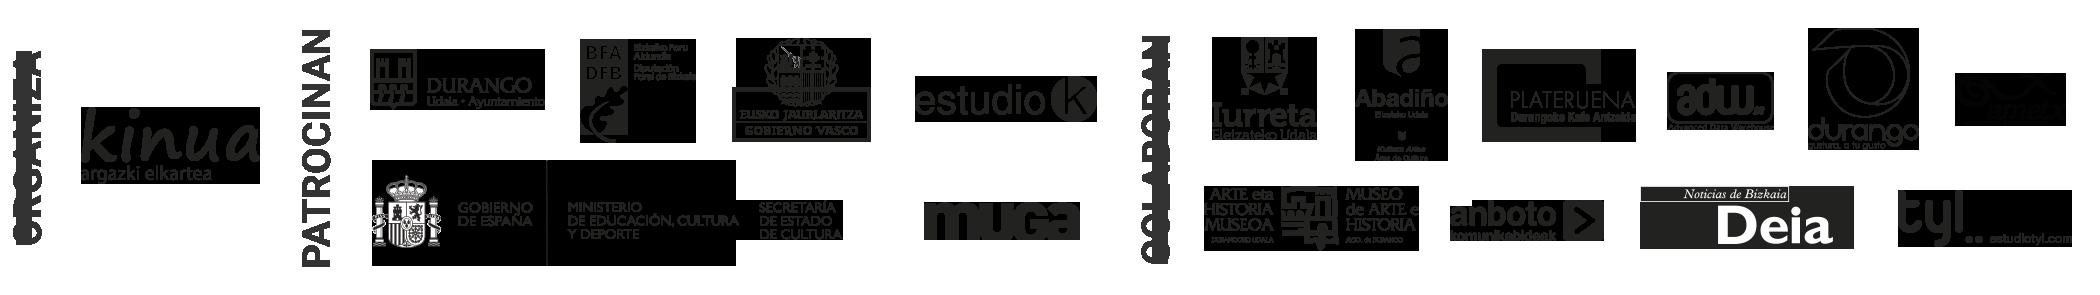 footer-logotipos-begira-2016-esp